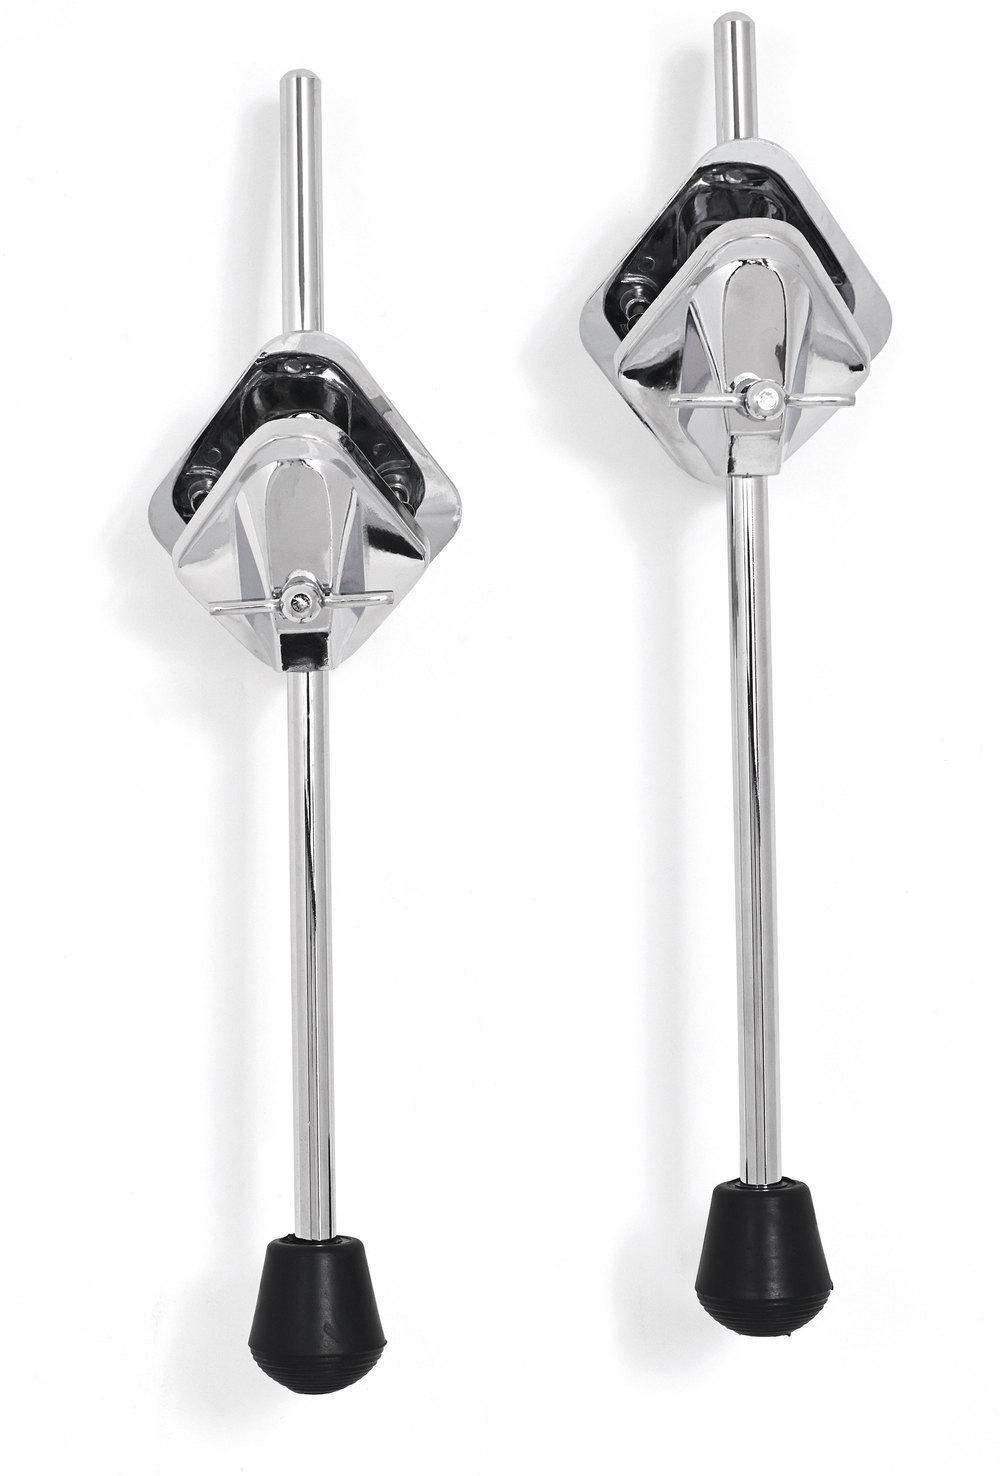 Image of   Gibraltar SC-BS2 Bass drum accessory Light Weight Spurs